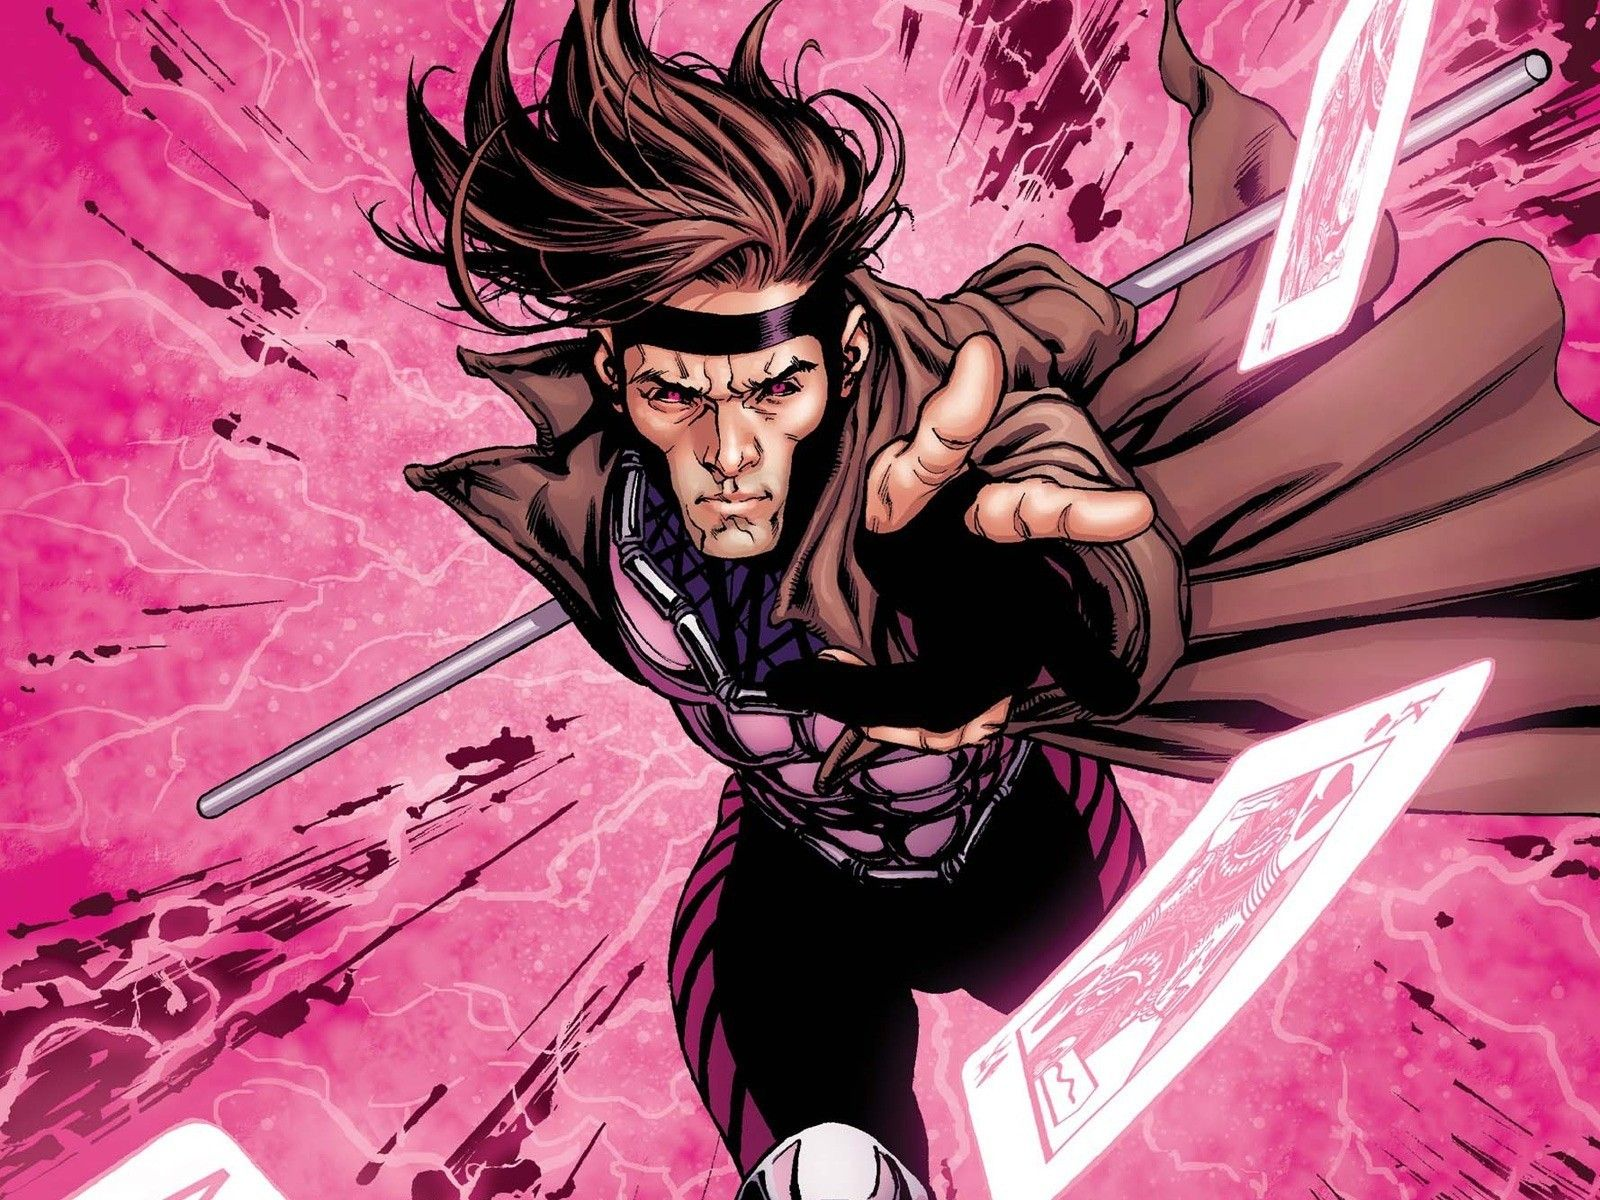 Free Marvel Gambit 1 Anime Hd Wallpaper All Free Picture Gambit Movie Superhero Movies Comic Book Heroes